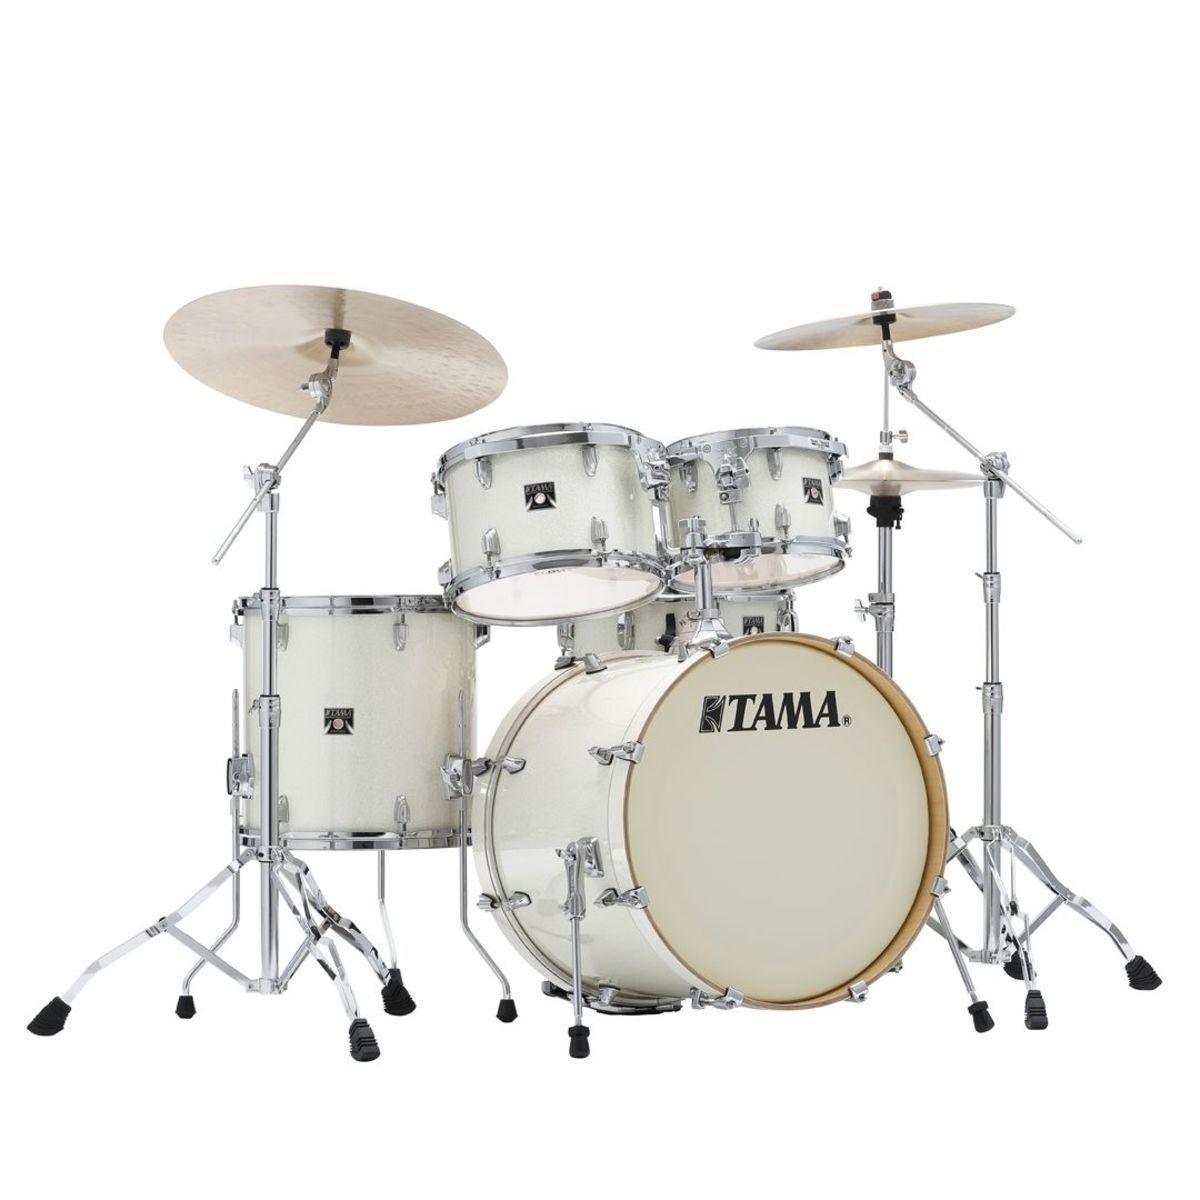 TAMA CK50RS-VWS - SHELL KIT - FINITURA VINTAGE WHITE SPARKLE